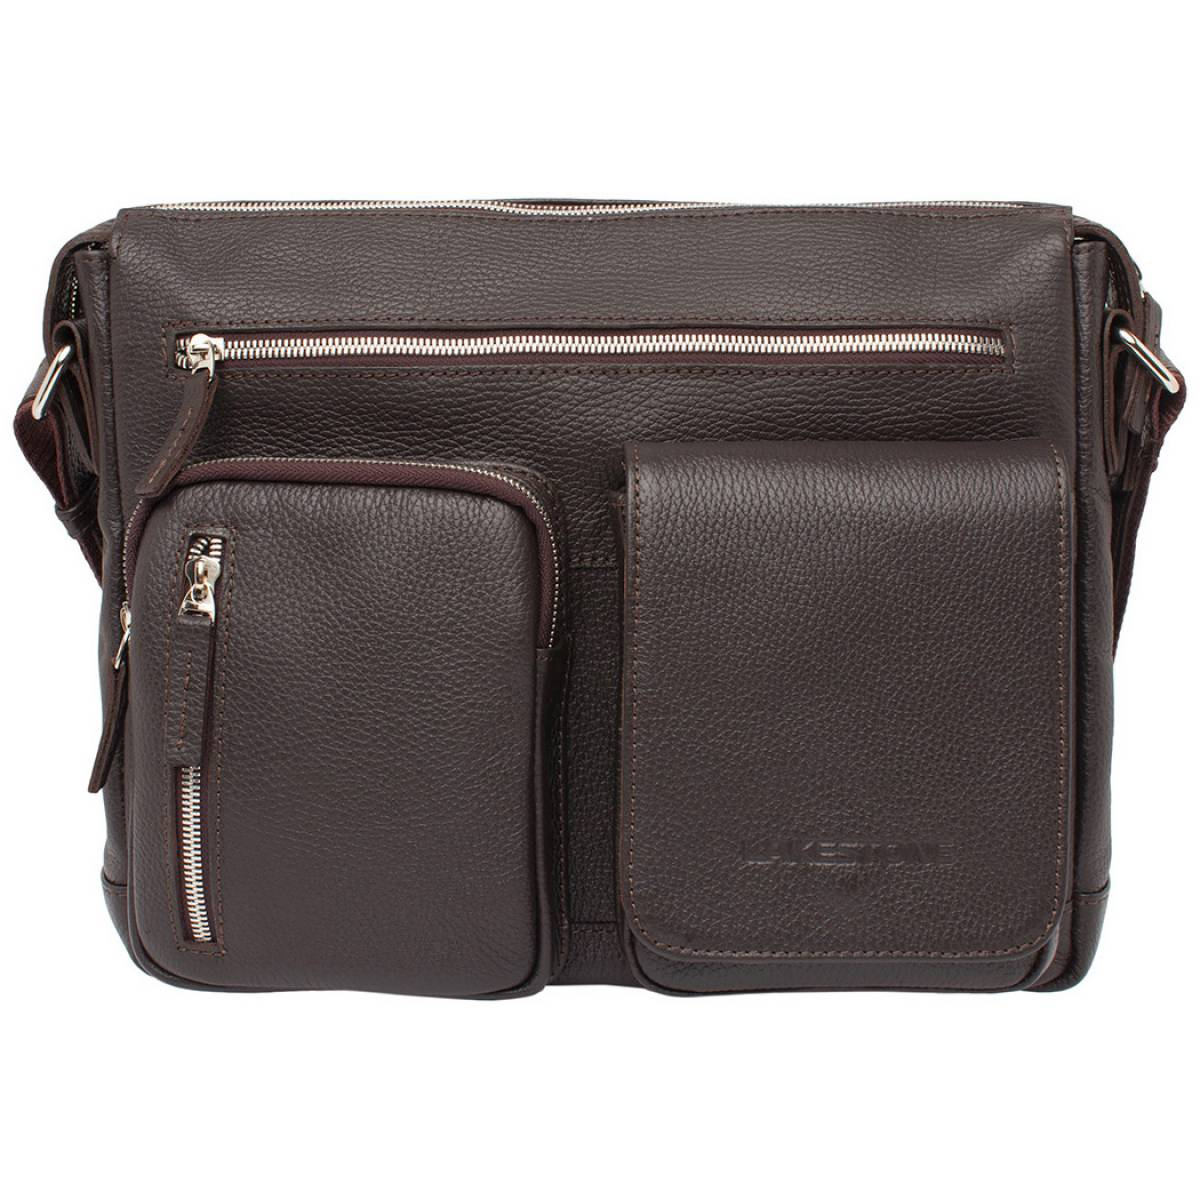 Мужская кожаная сумка через плечо Clapton Brown